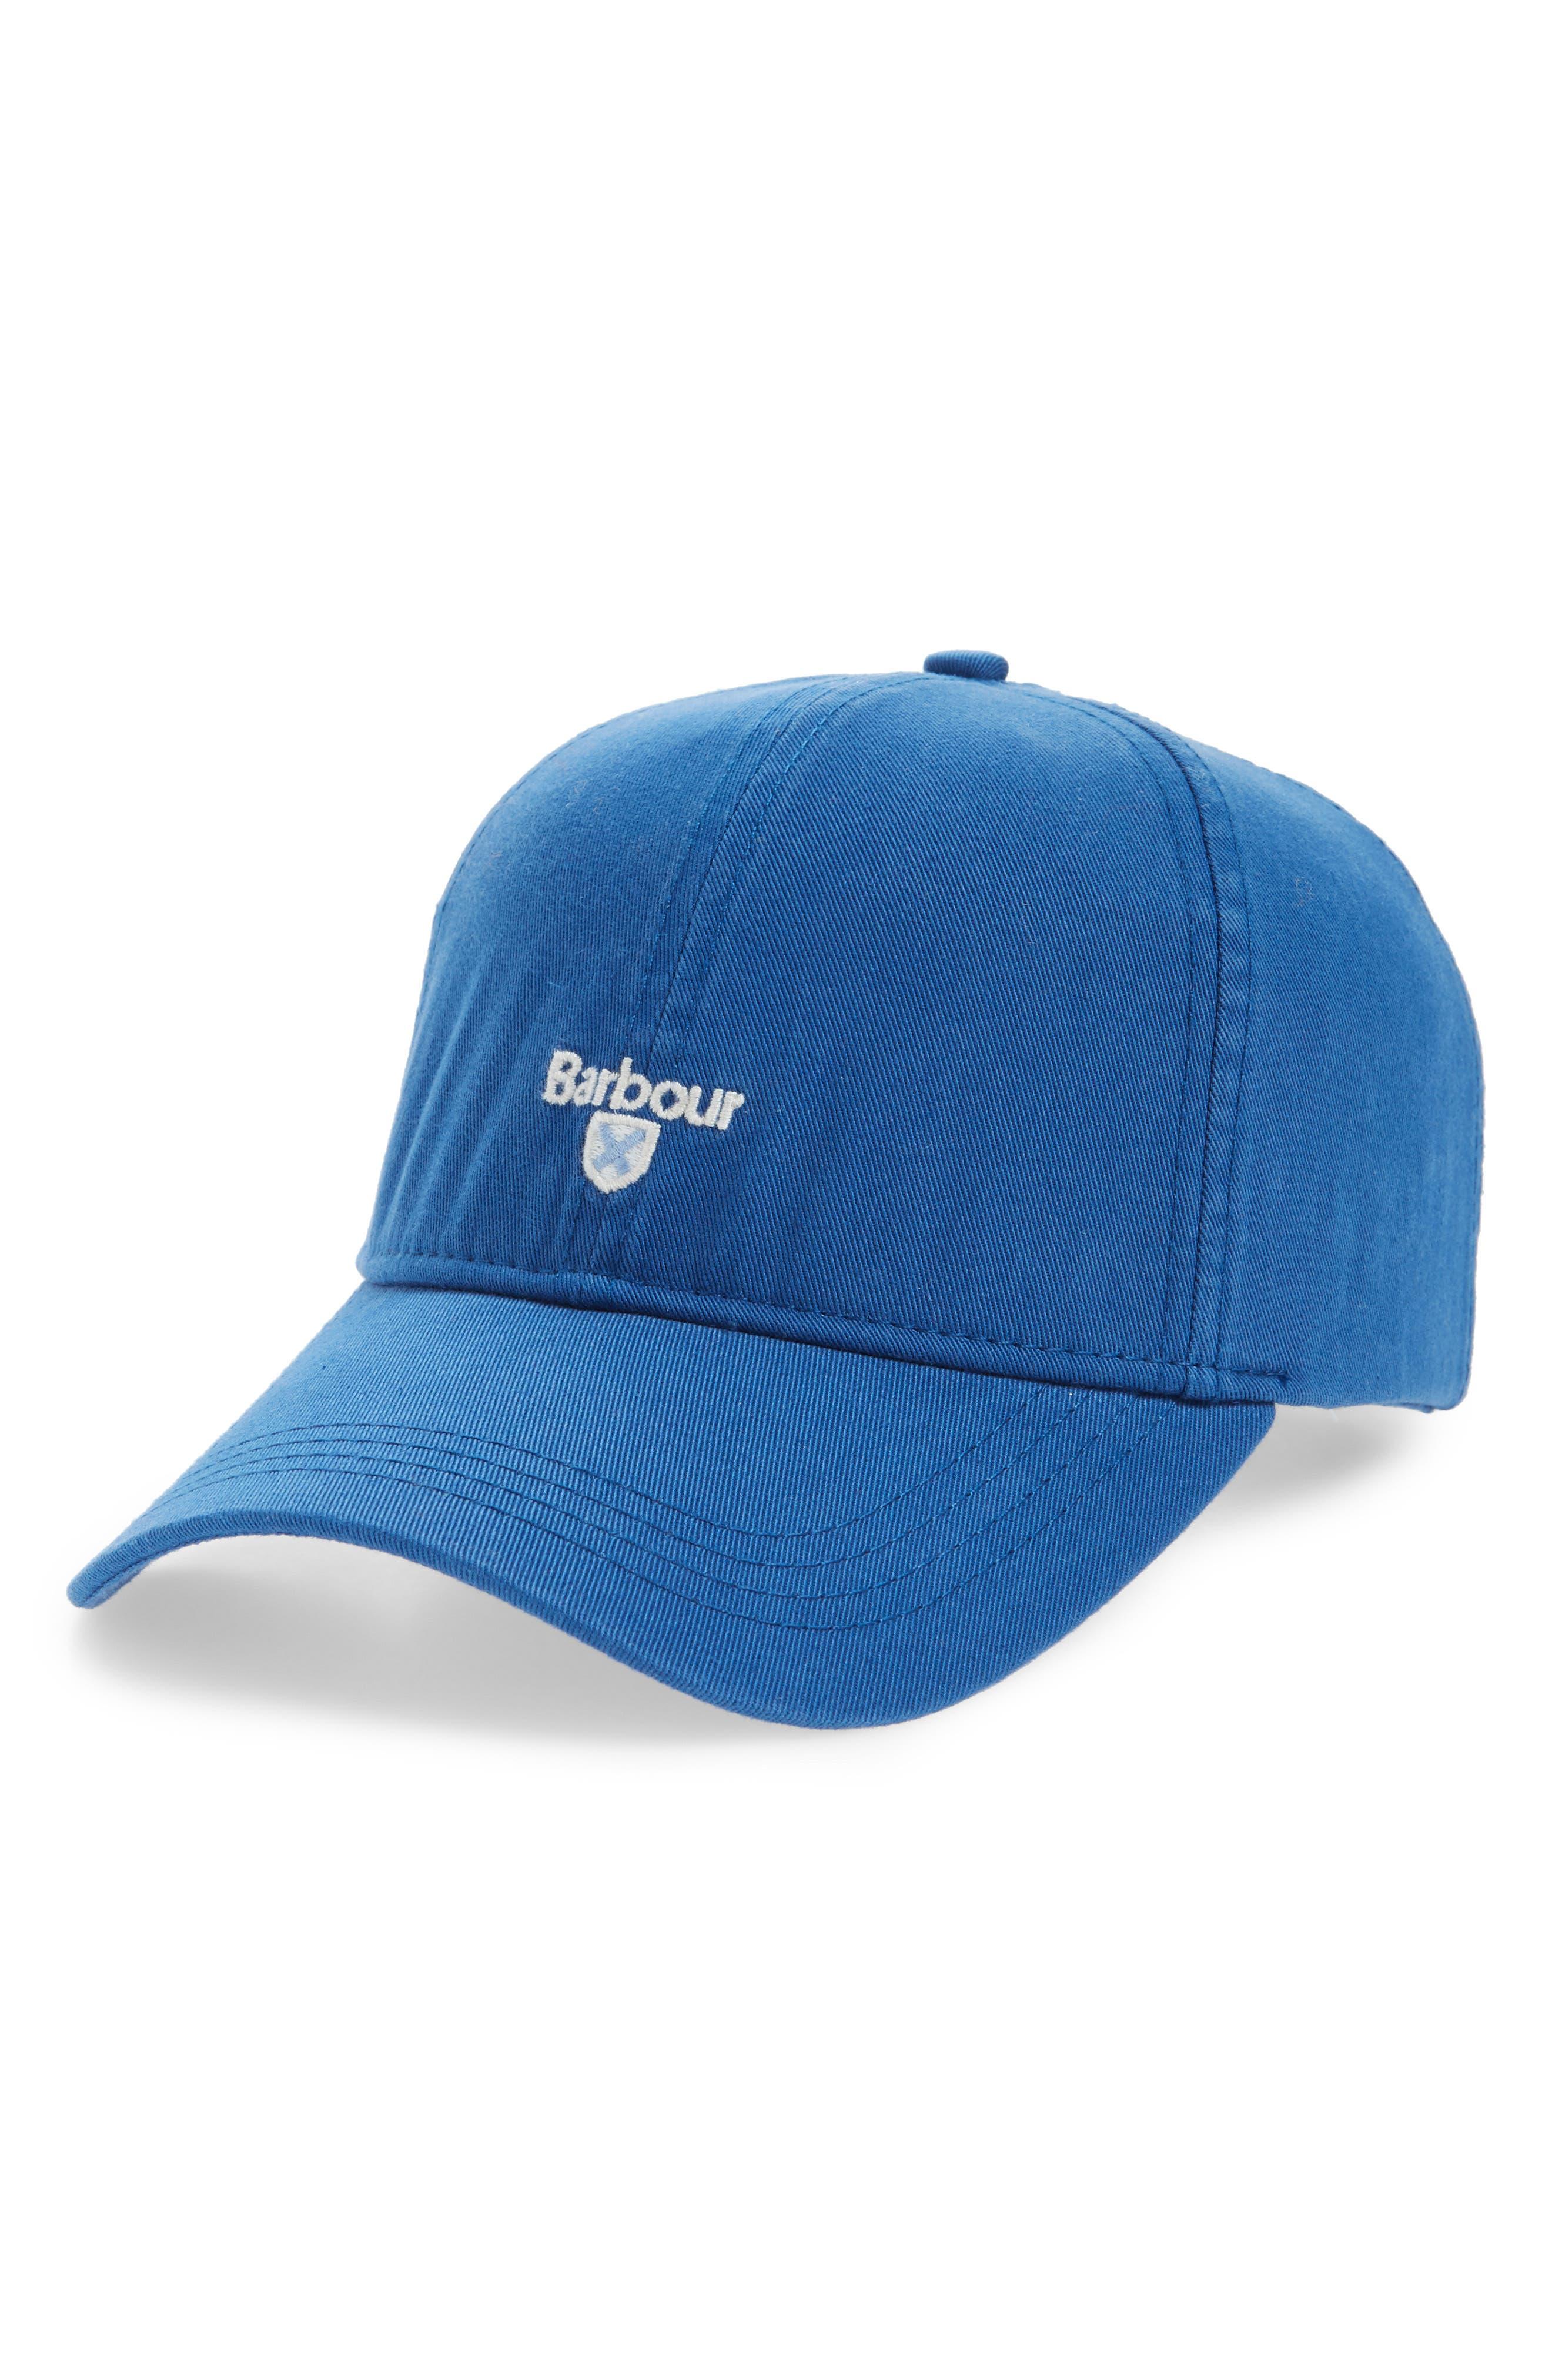 8ebe9a26b33 Baseball Hats for Men   Dad Hats